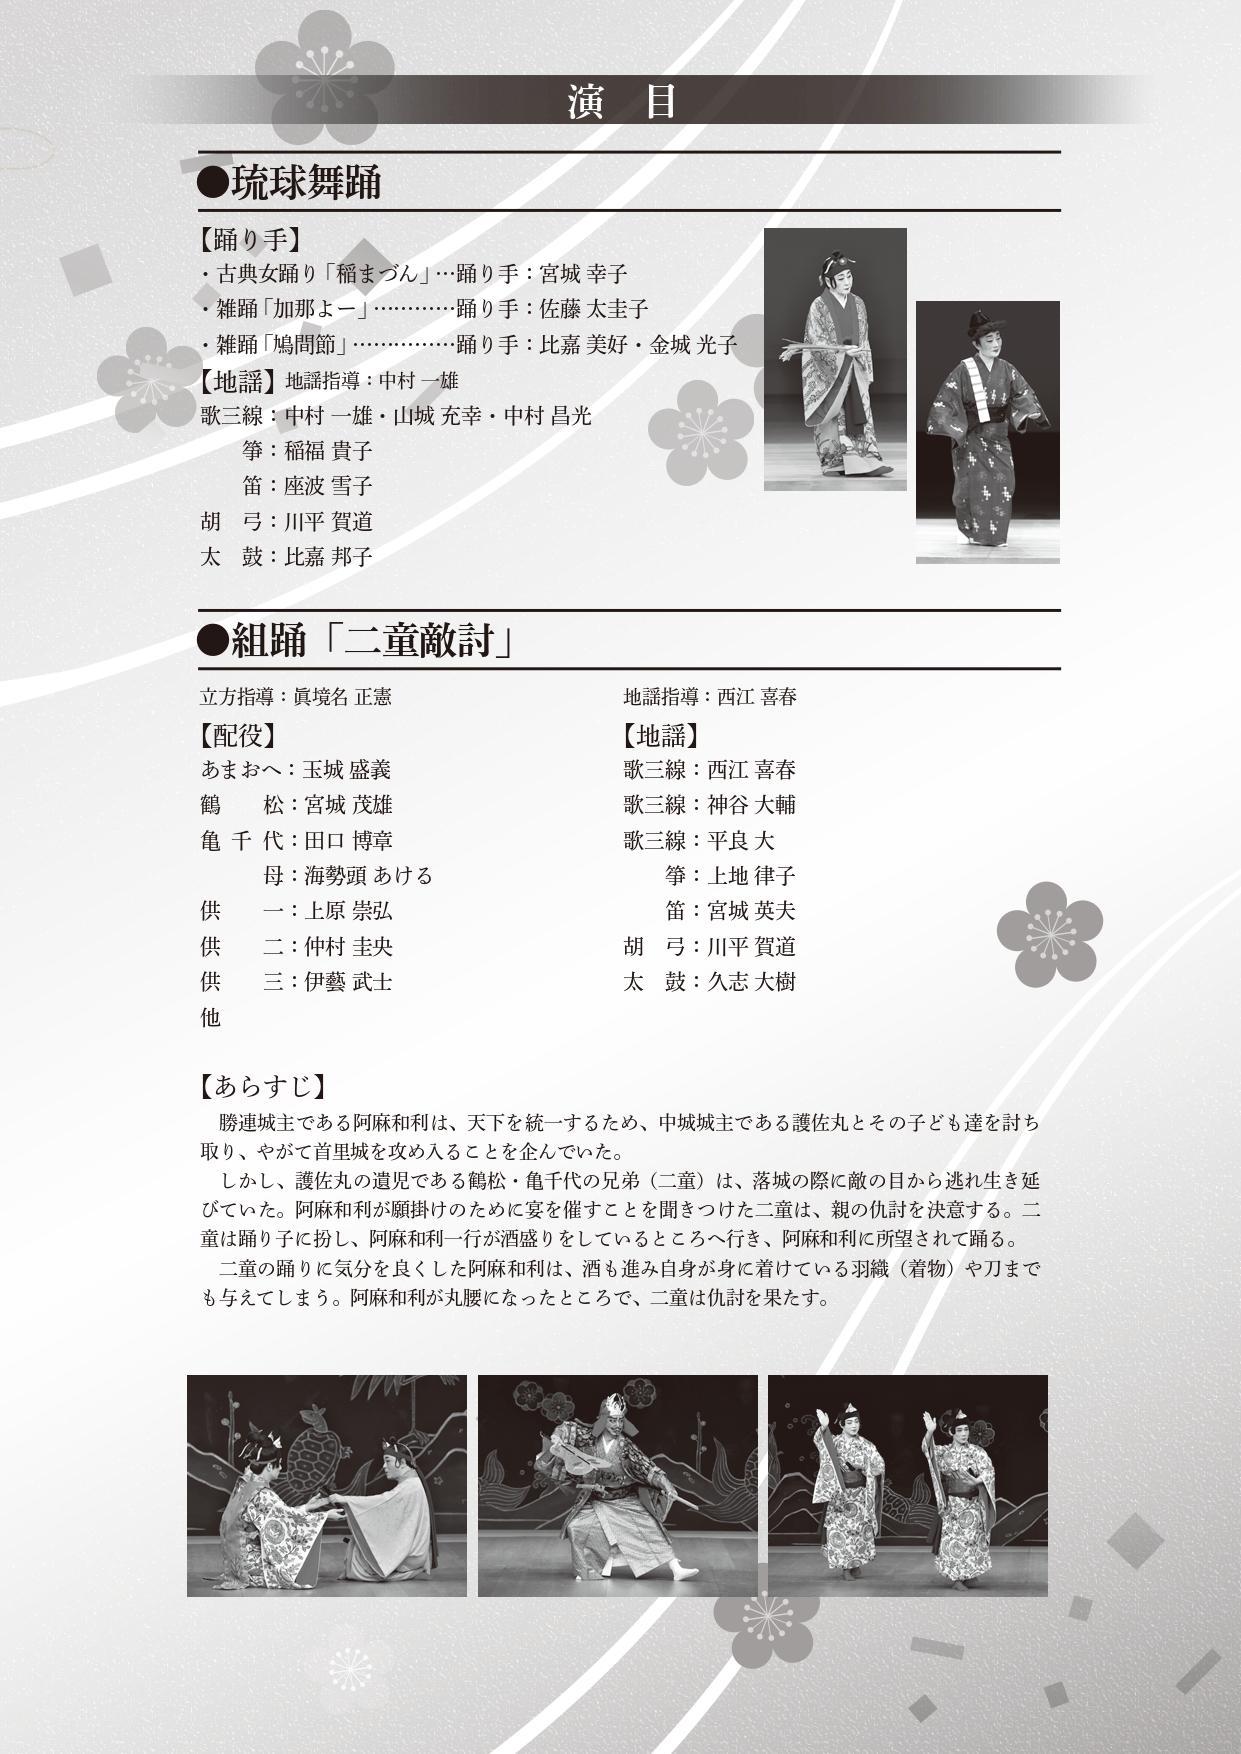 http://okicul-pr.jp/kariyushi/news/1af99ce1f23a3e64a67ad6760baaf9d41cbadcf3.jpg